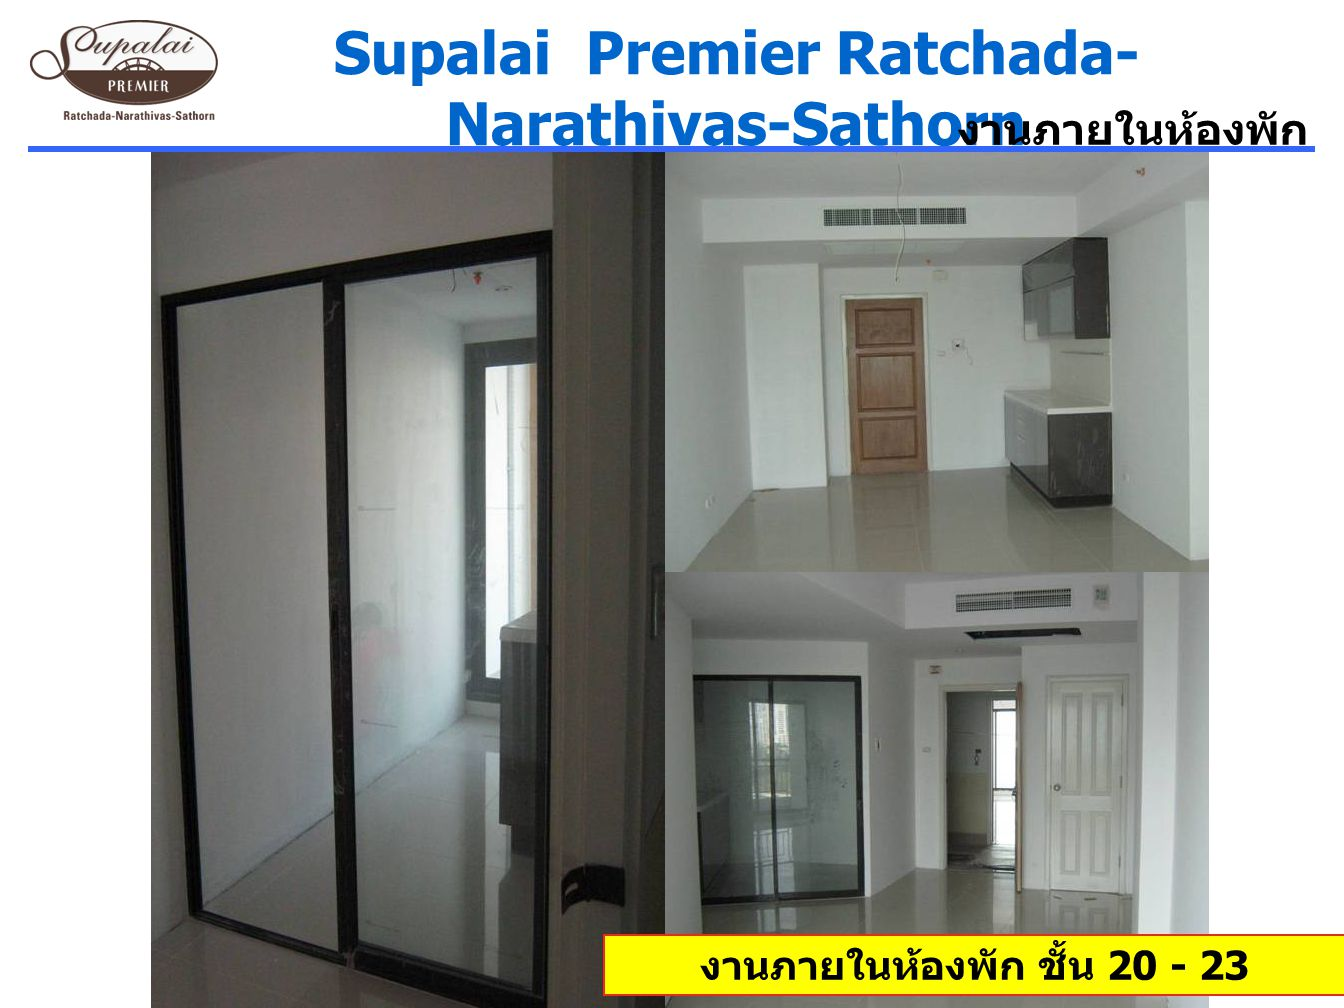 Supalai Premier Ratchada- Narathivas-Sathorn งานภายในห้องพัก งานภายในห้องพัก ชั้น 20 - 23